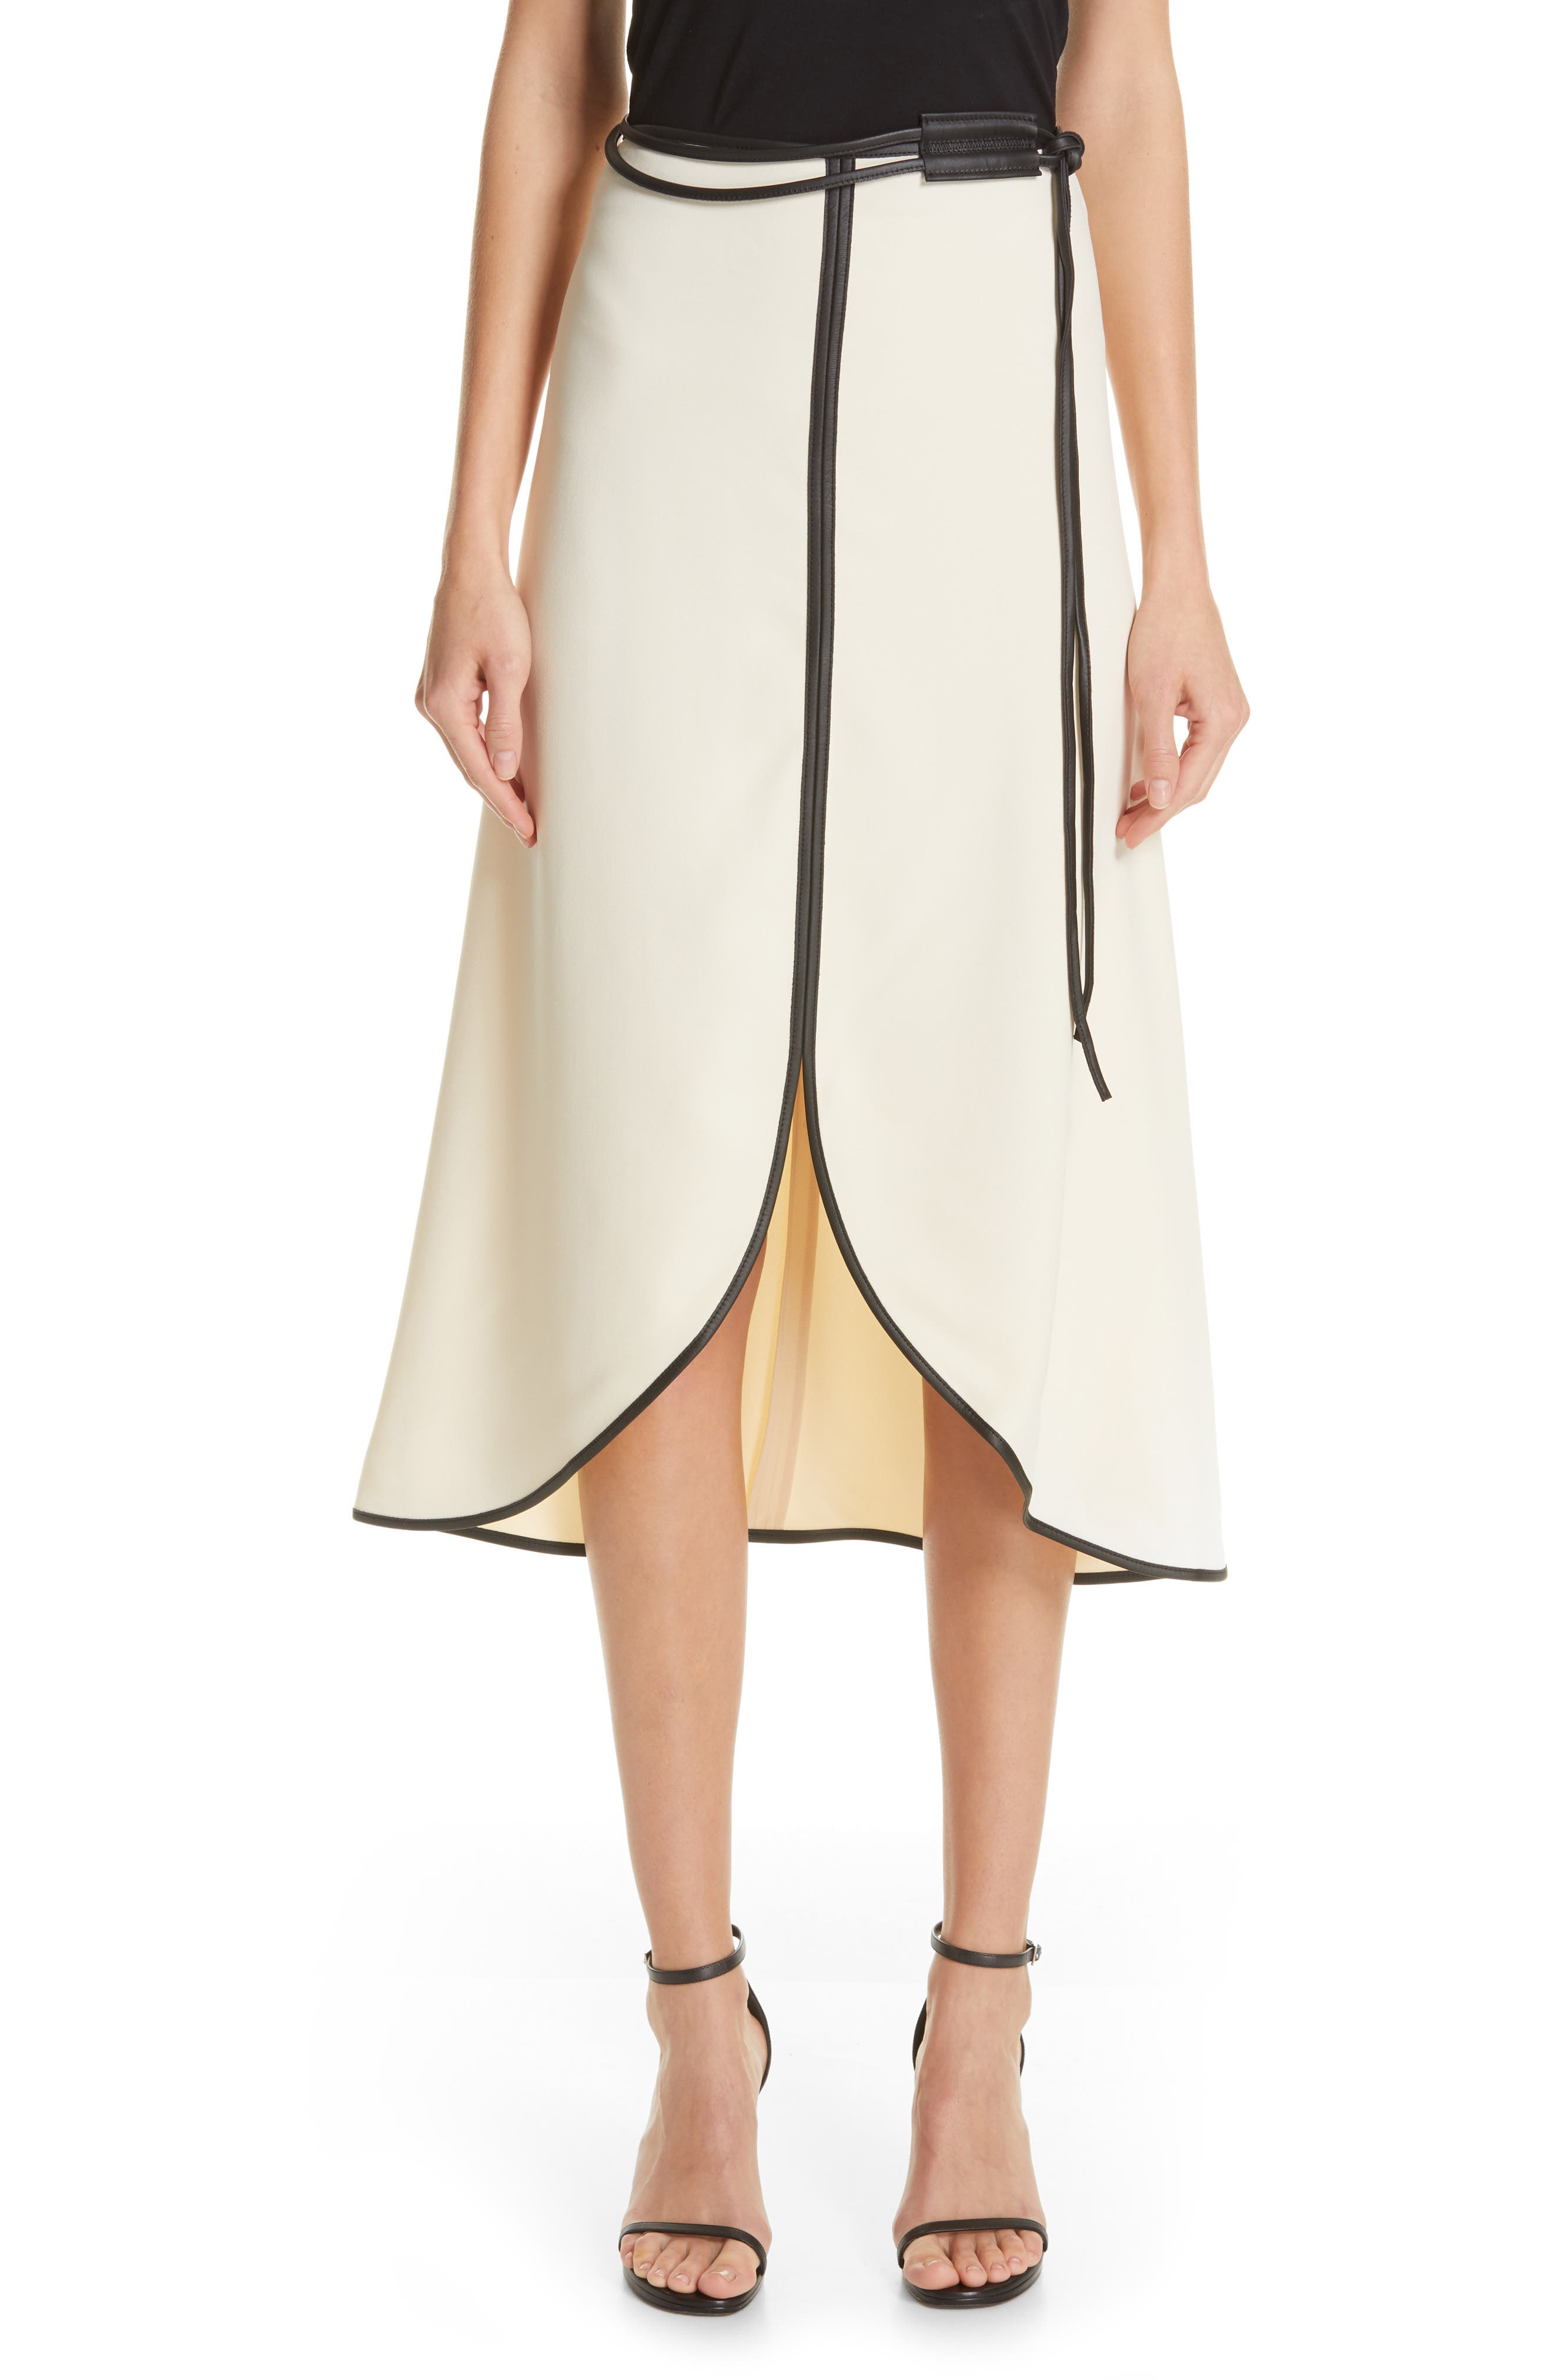 VICTORIA BECKHAM Leather Trim Midi Skirt, Main, color, MILK/ BLACK